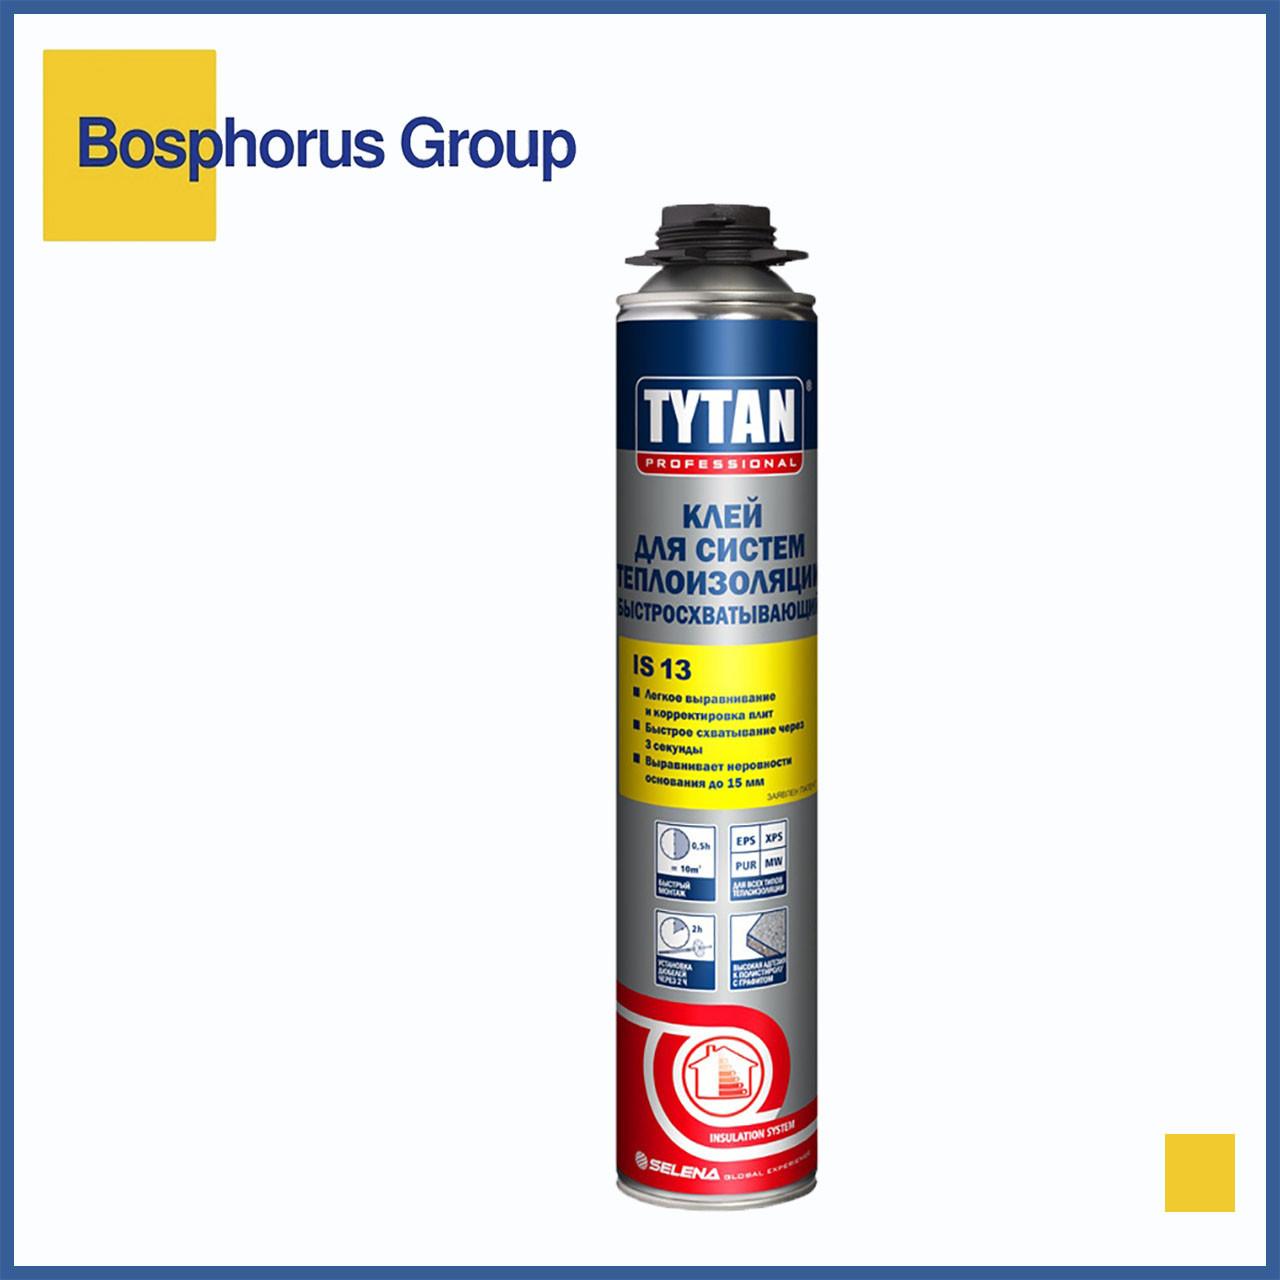 Пено-Клей TYTAN IS13 для систем теплоизоляции